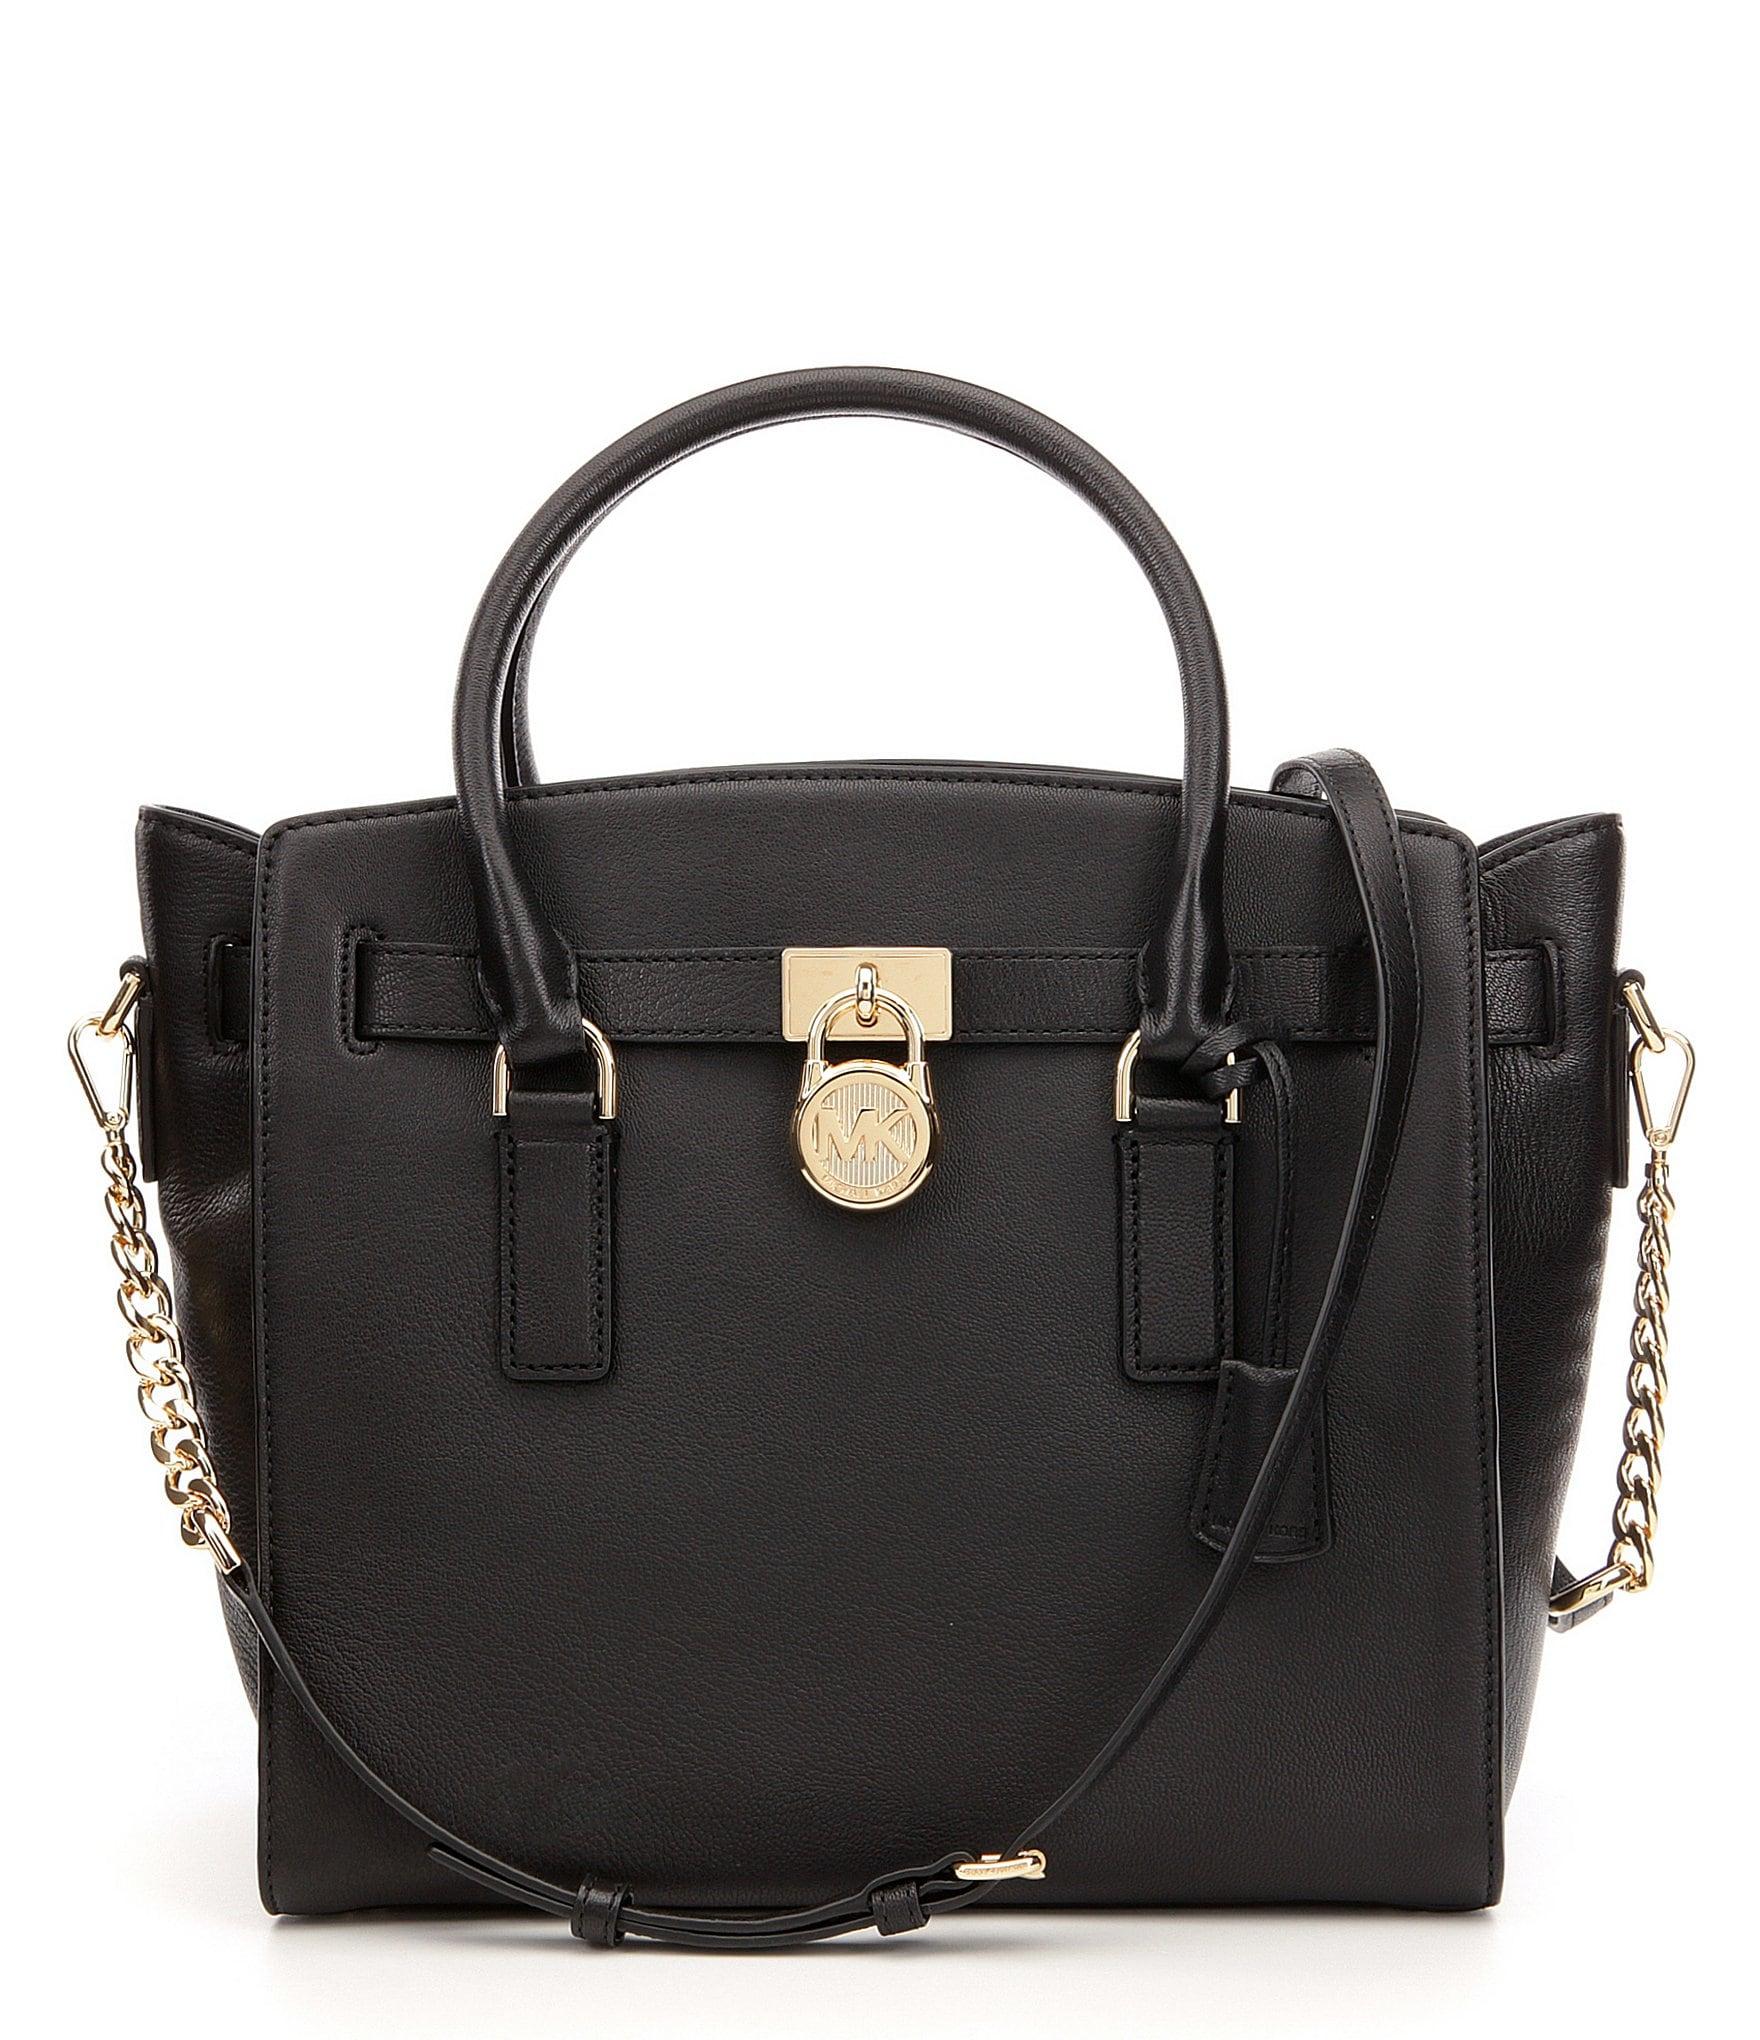 bbed284b1501 Buy michael kors hamilton handbag   OFF65% Discounted